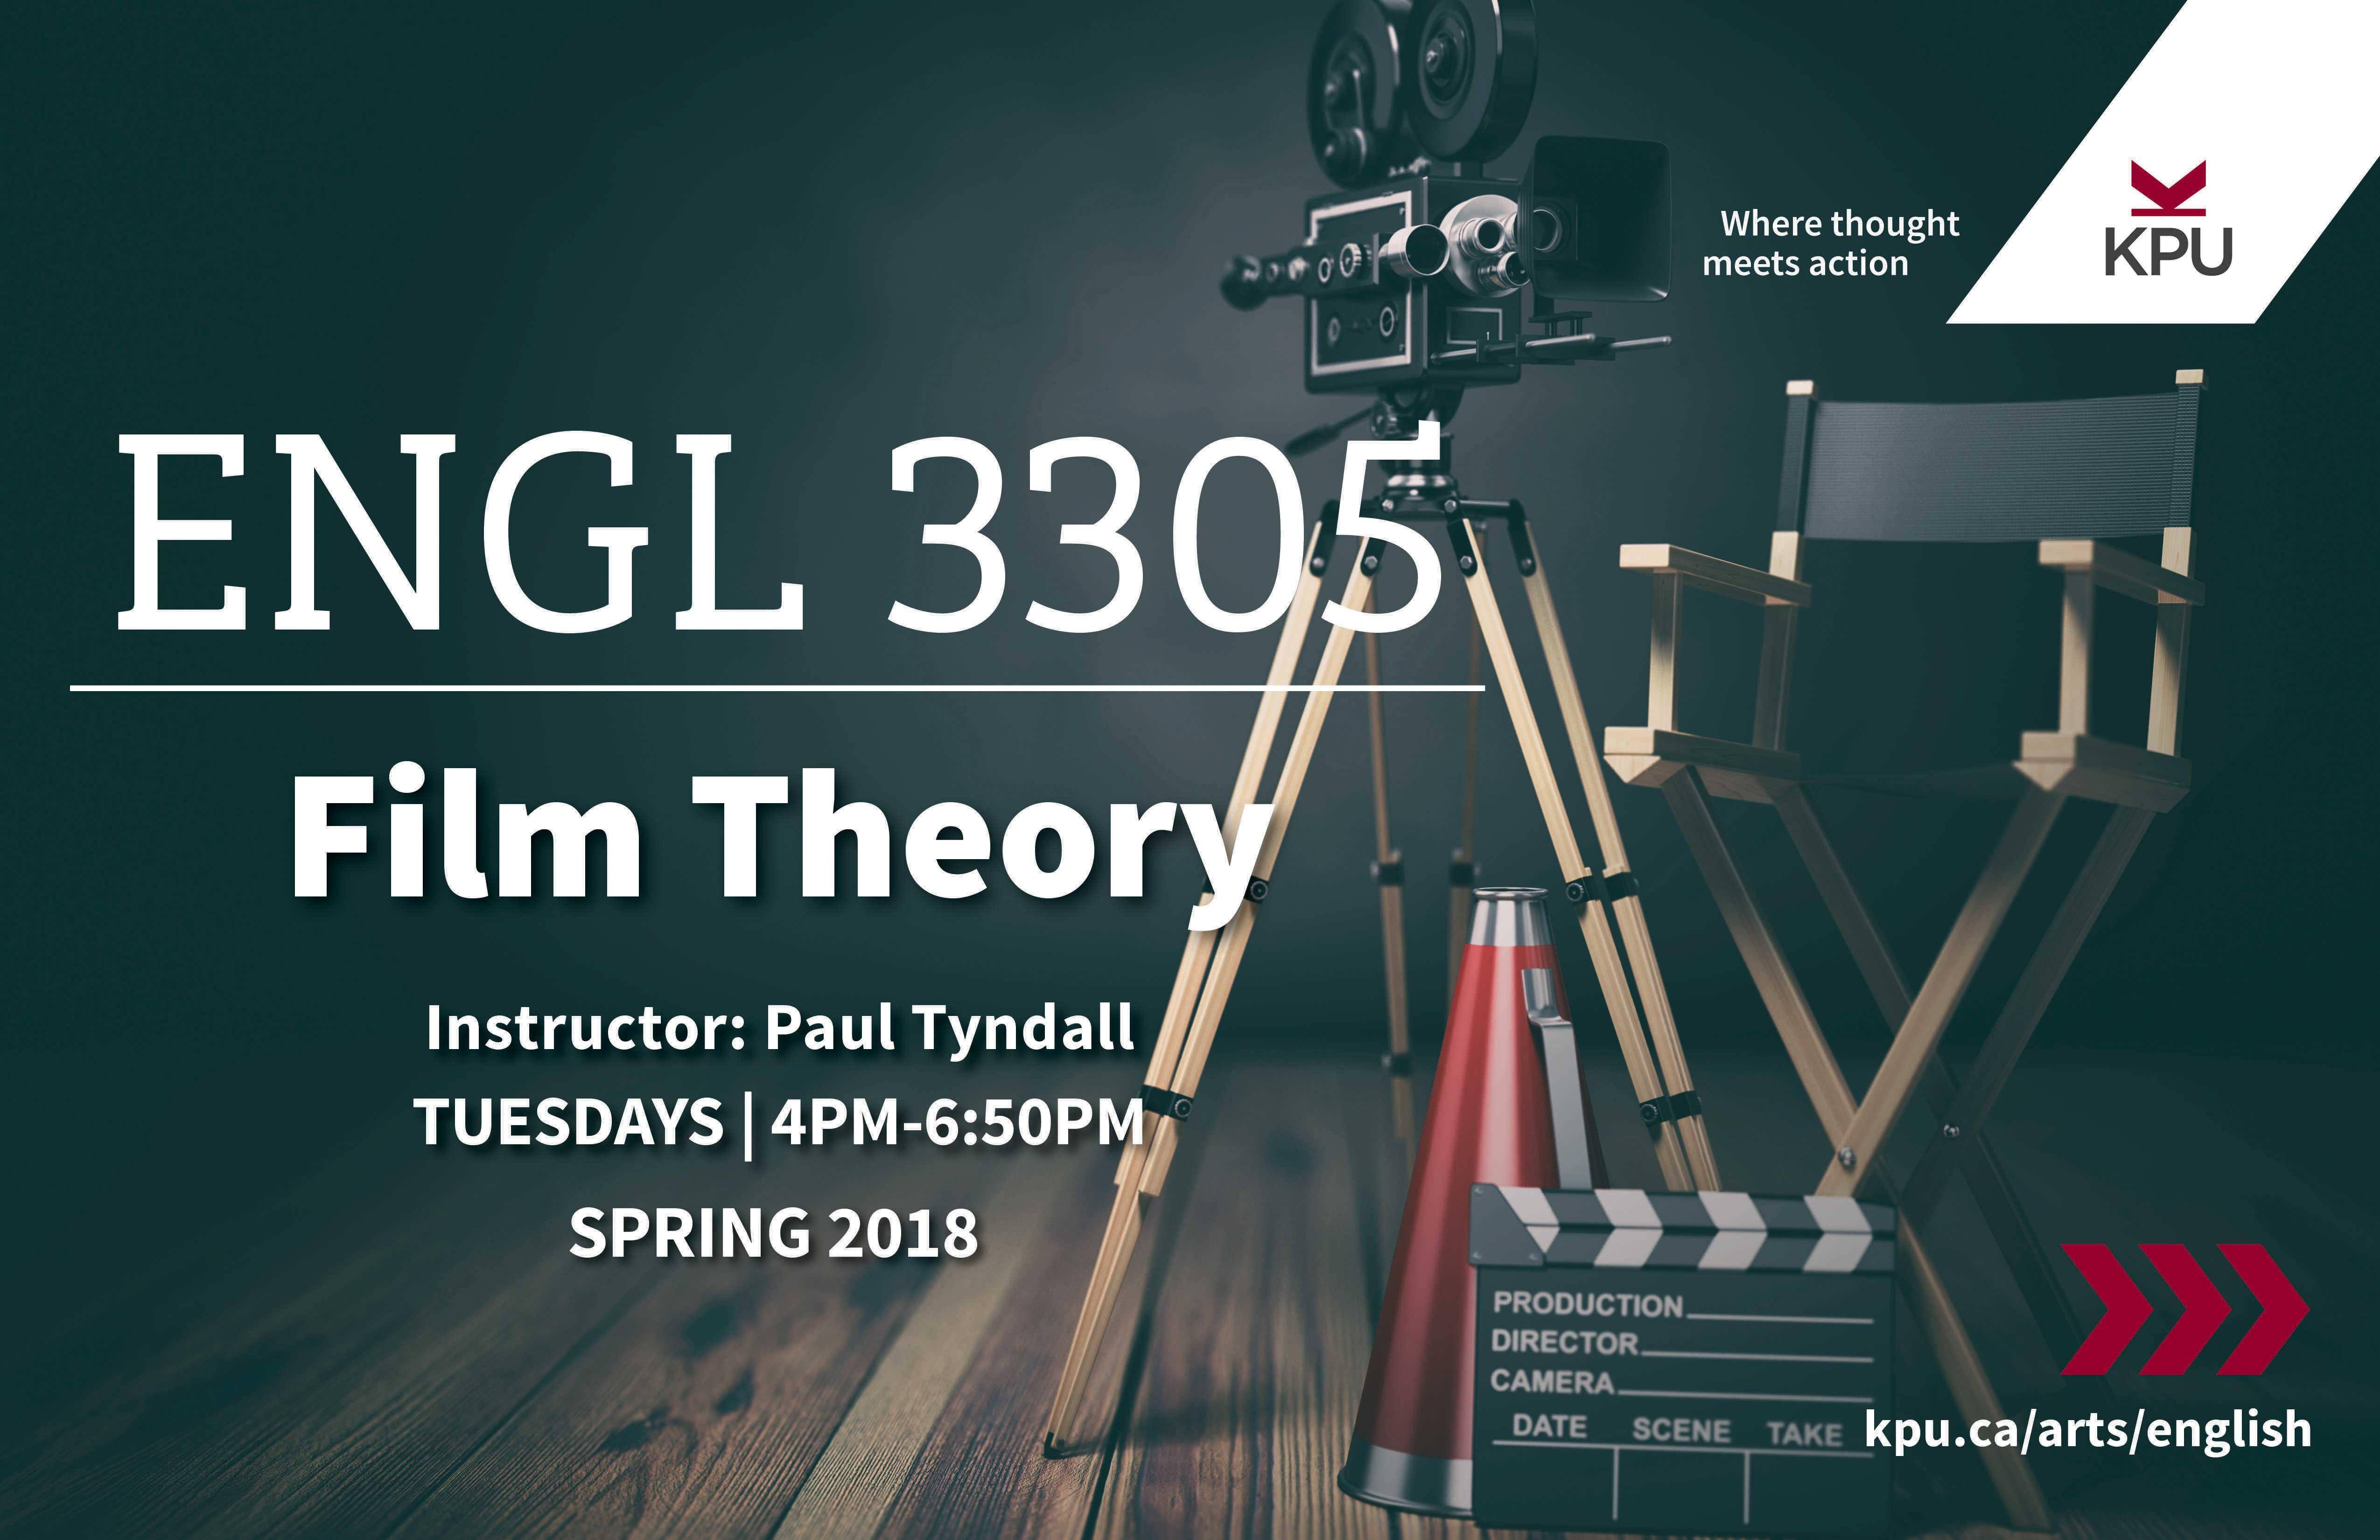 Spring 2018 English Courses